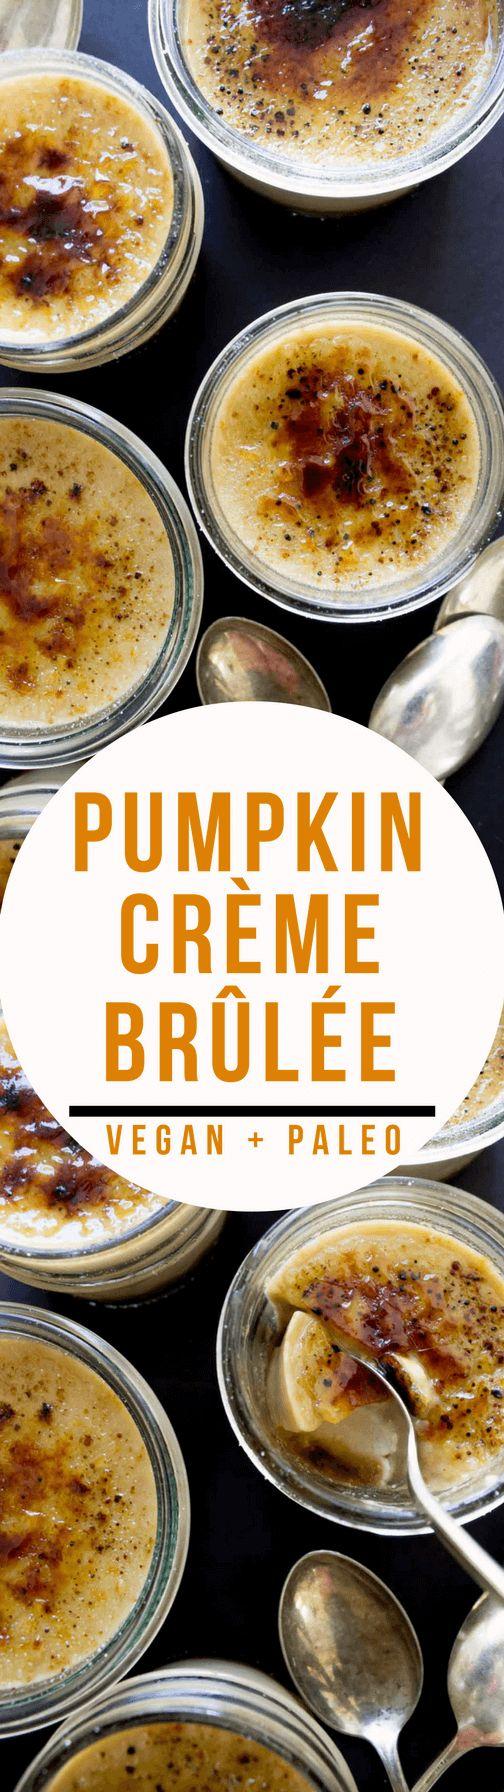 pumpkin-creme-brulee-paleo-vegan